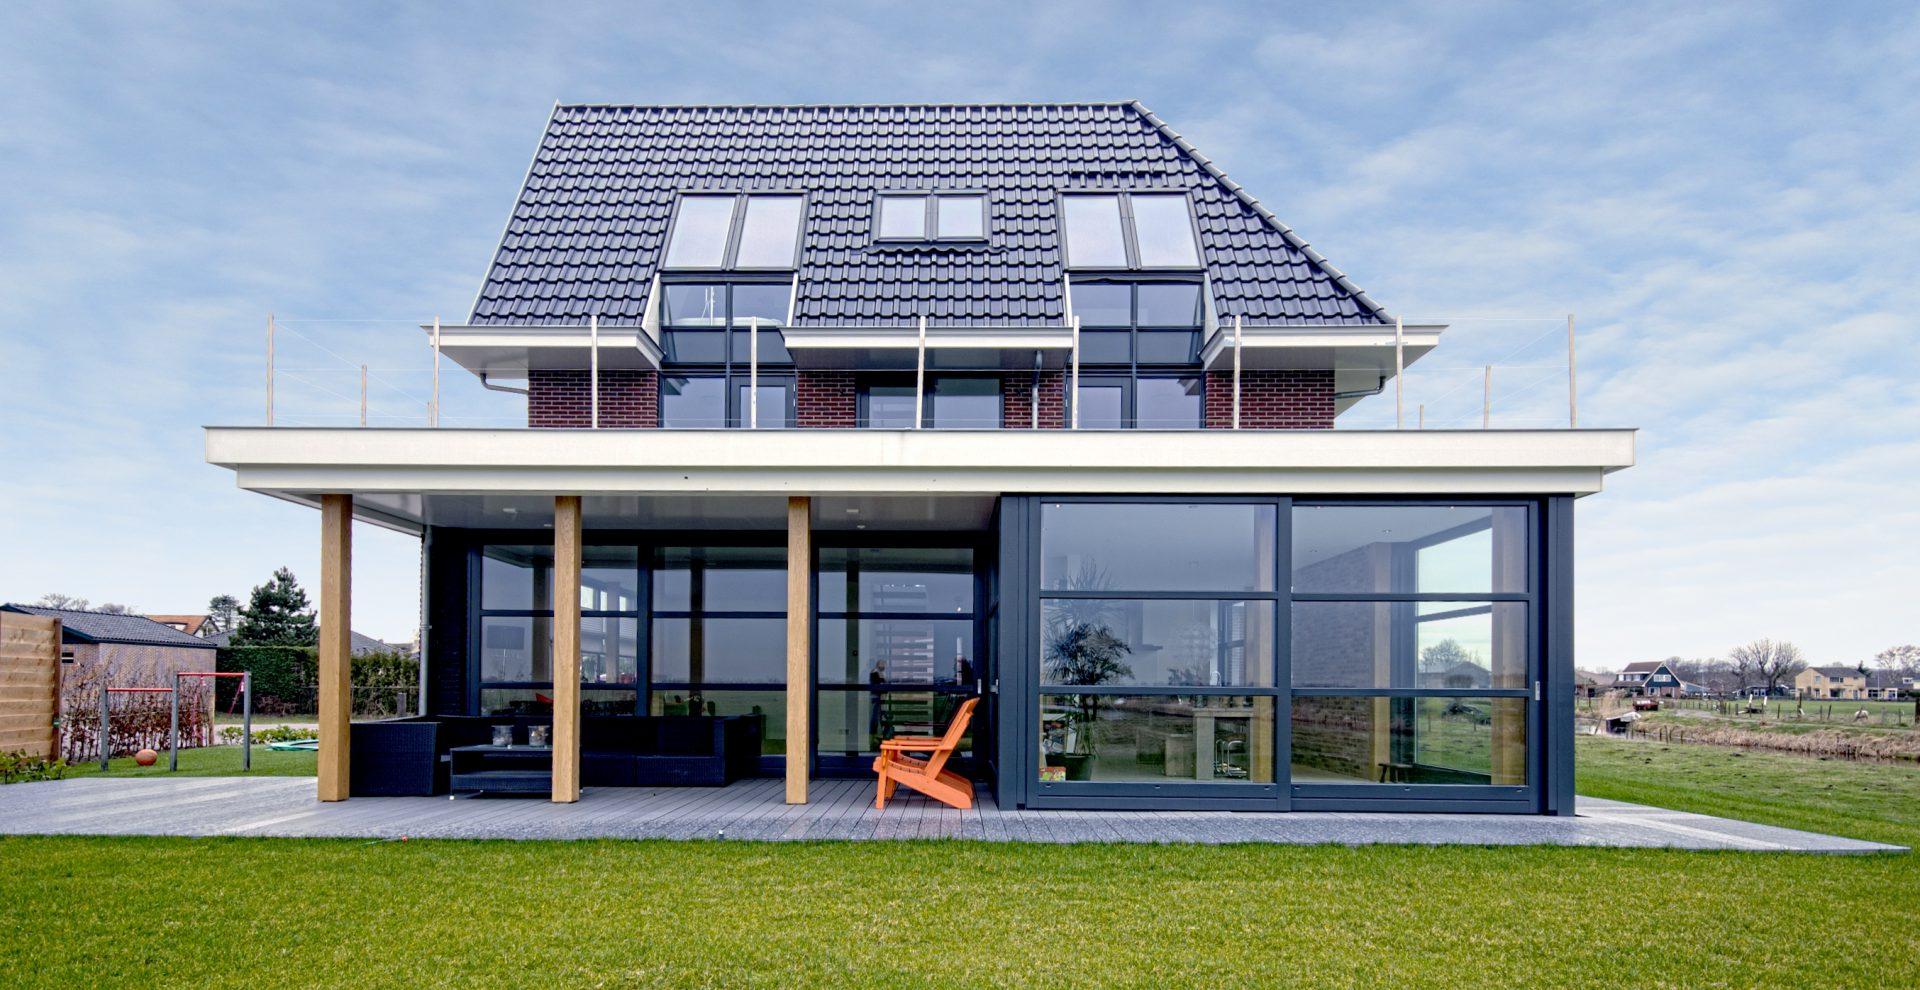 Duurzame Villa te Limmen Zijlstra Schipper Architecten Noord-Holland achtergevel frontaal